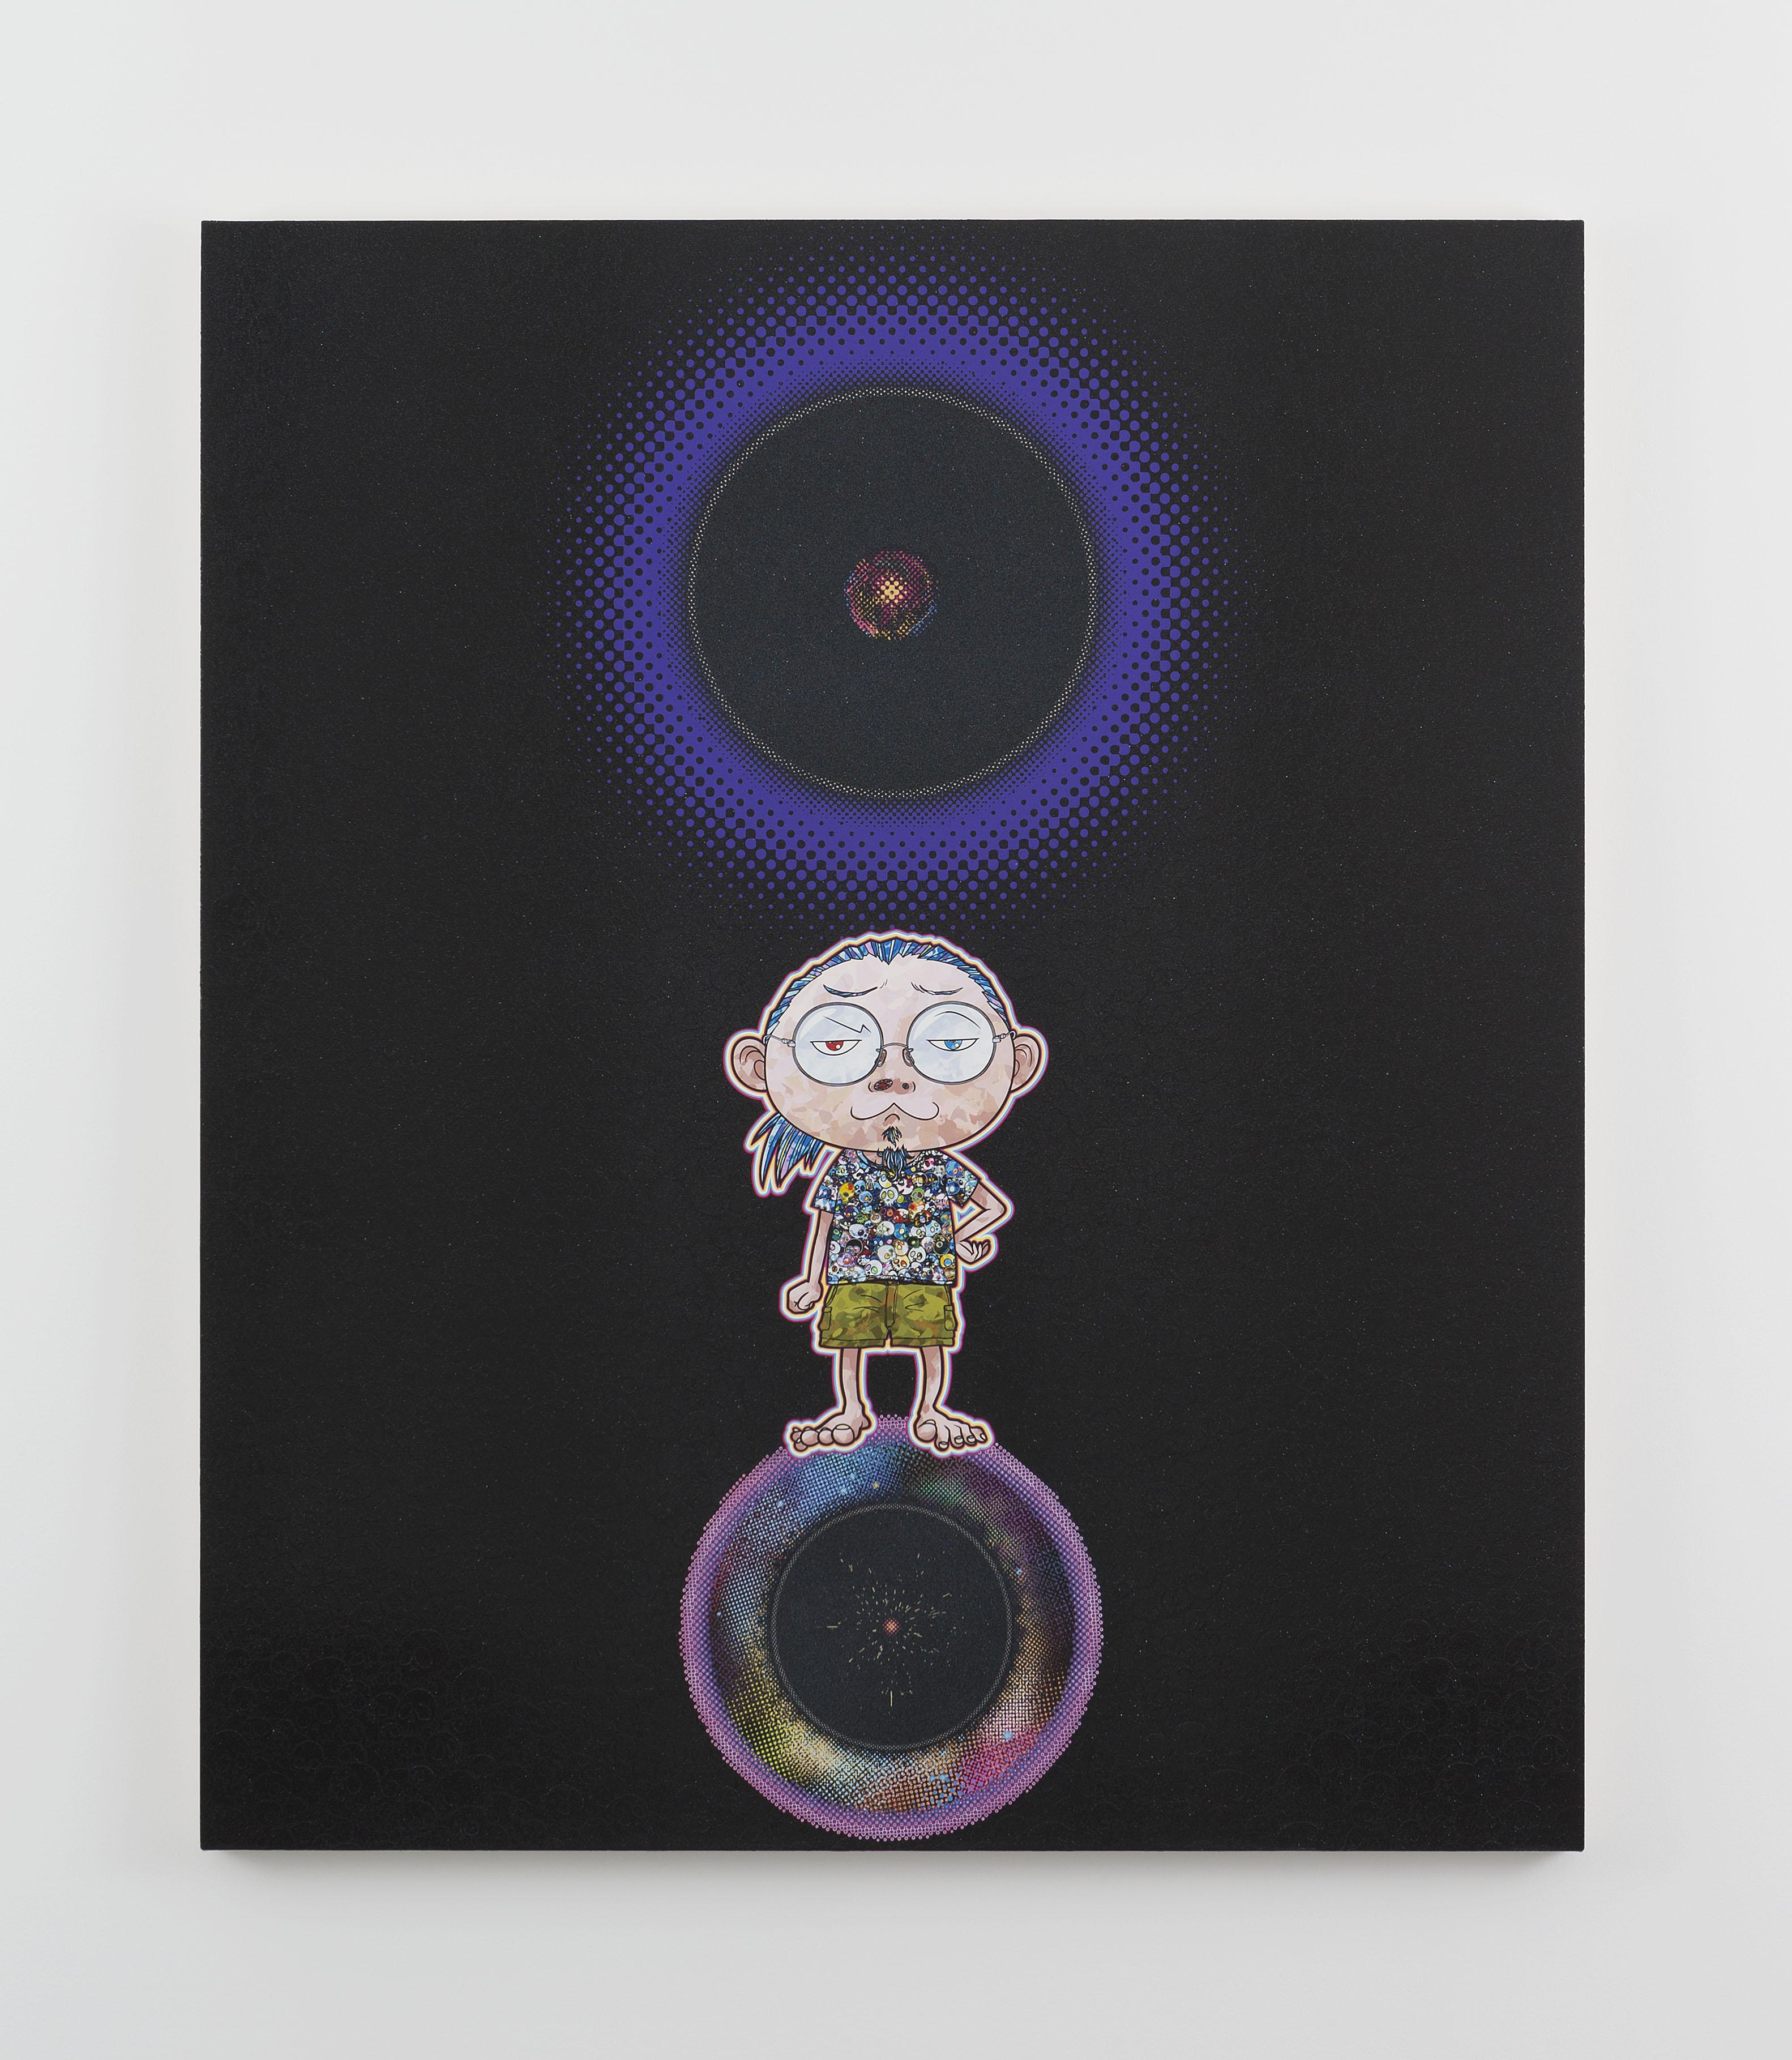 Ensō: At Our Side, Bending Space-time, 2015 © 2015 Takashi Murakami/Kaikai Kiki Co., Ltd. All Rights Reserved. Courtesy Galerie Perrotin